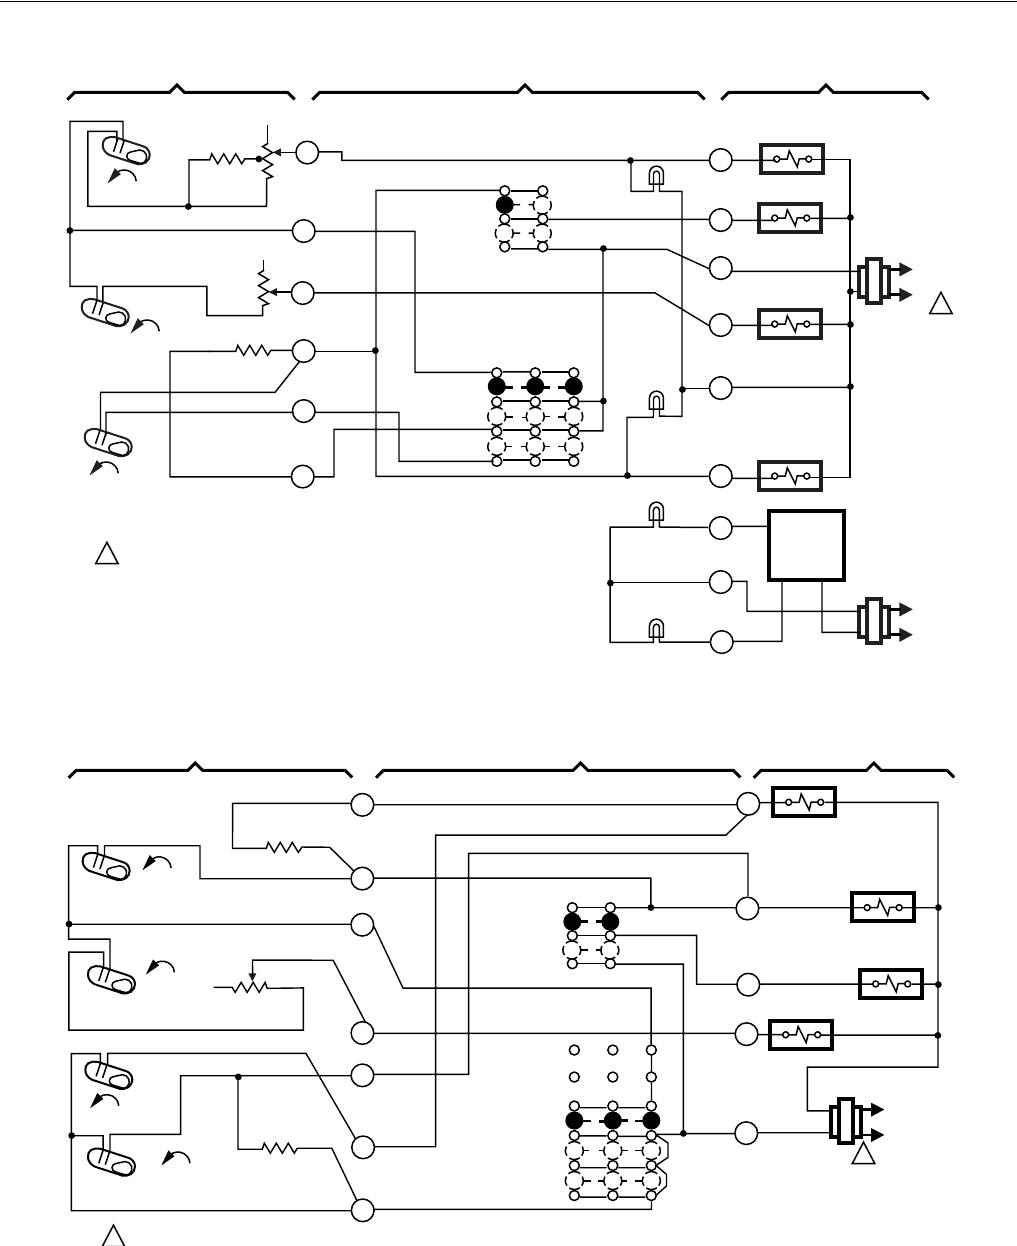 Line Reactor Wiring Diagram - Schematic Diagrams on line reactor allen bradley, line driver wiring diagram, simple electric generator diagram, load reactor wiring diagram, single-line diagram, line and load wiring diagram,